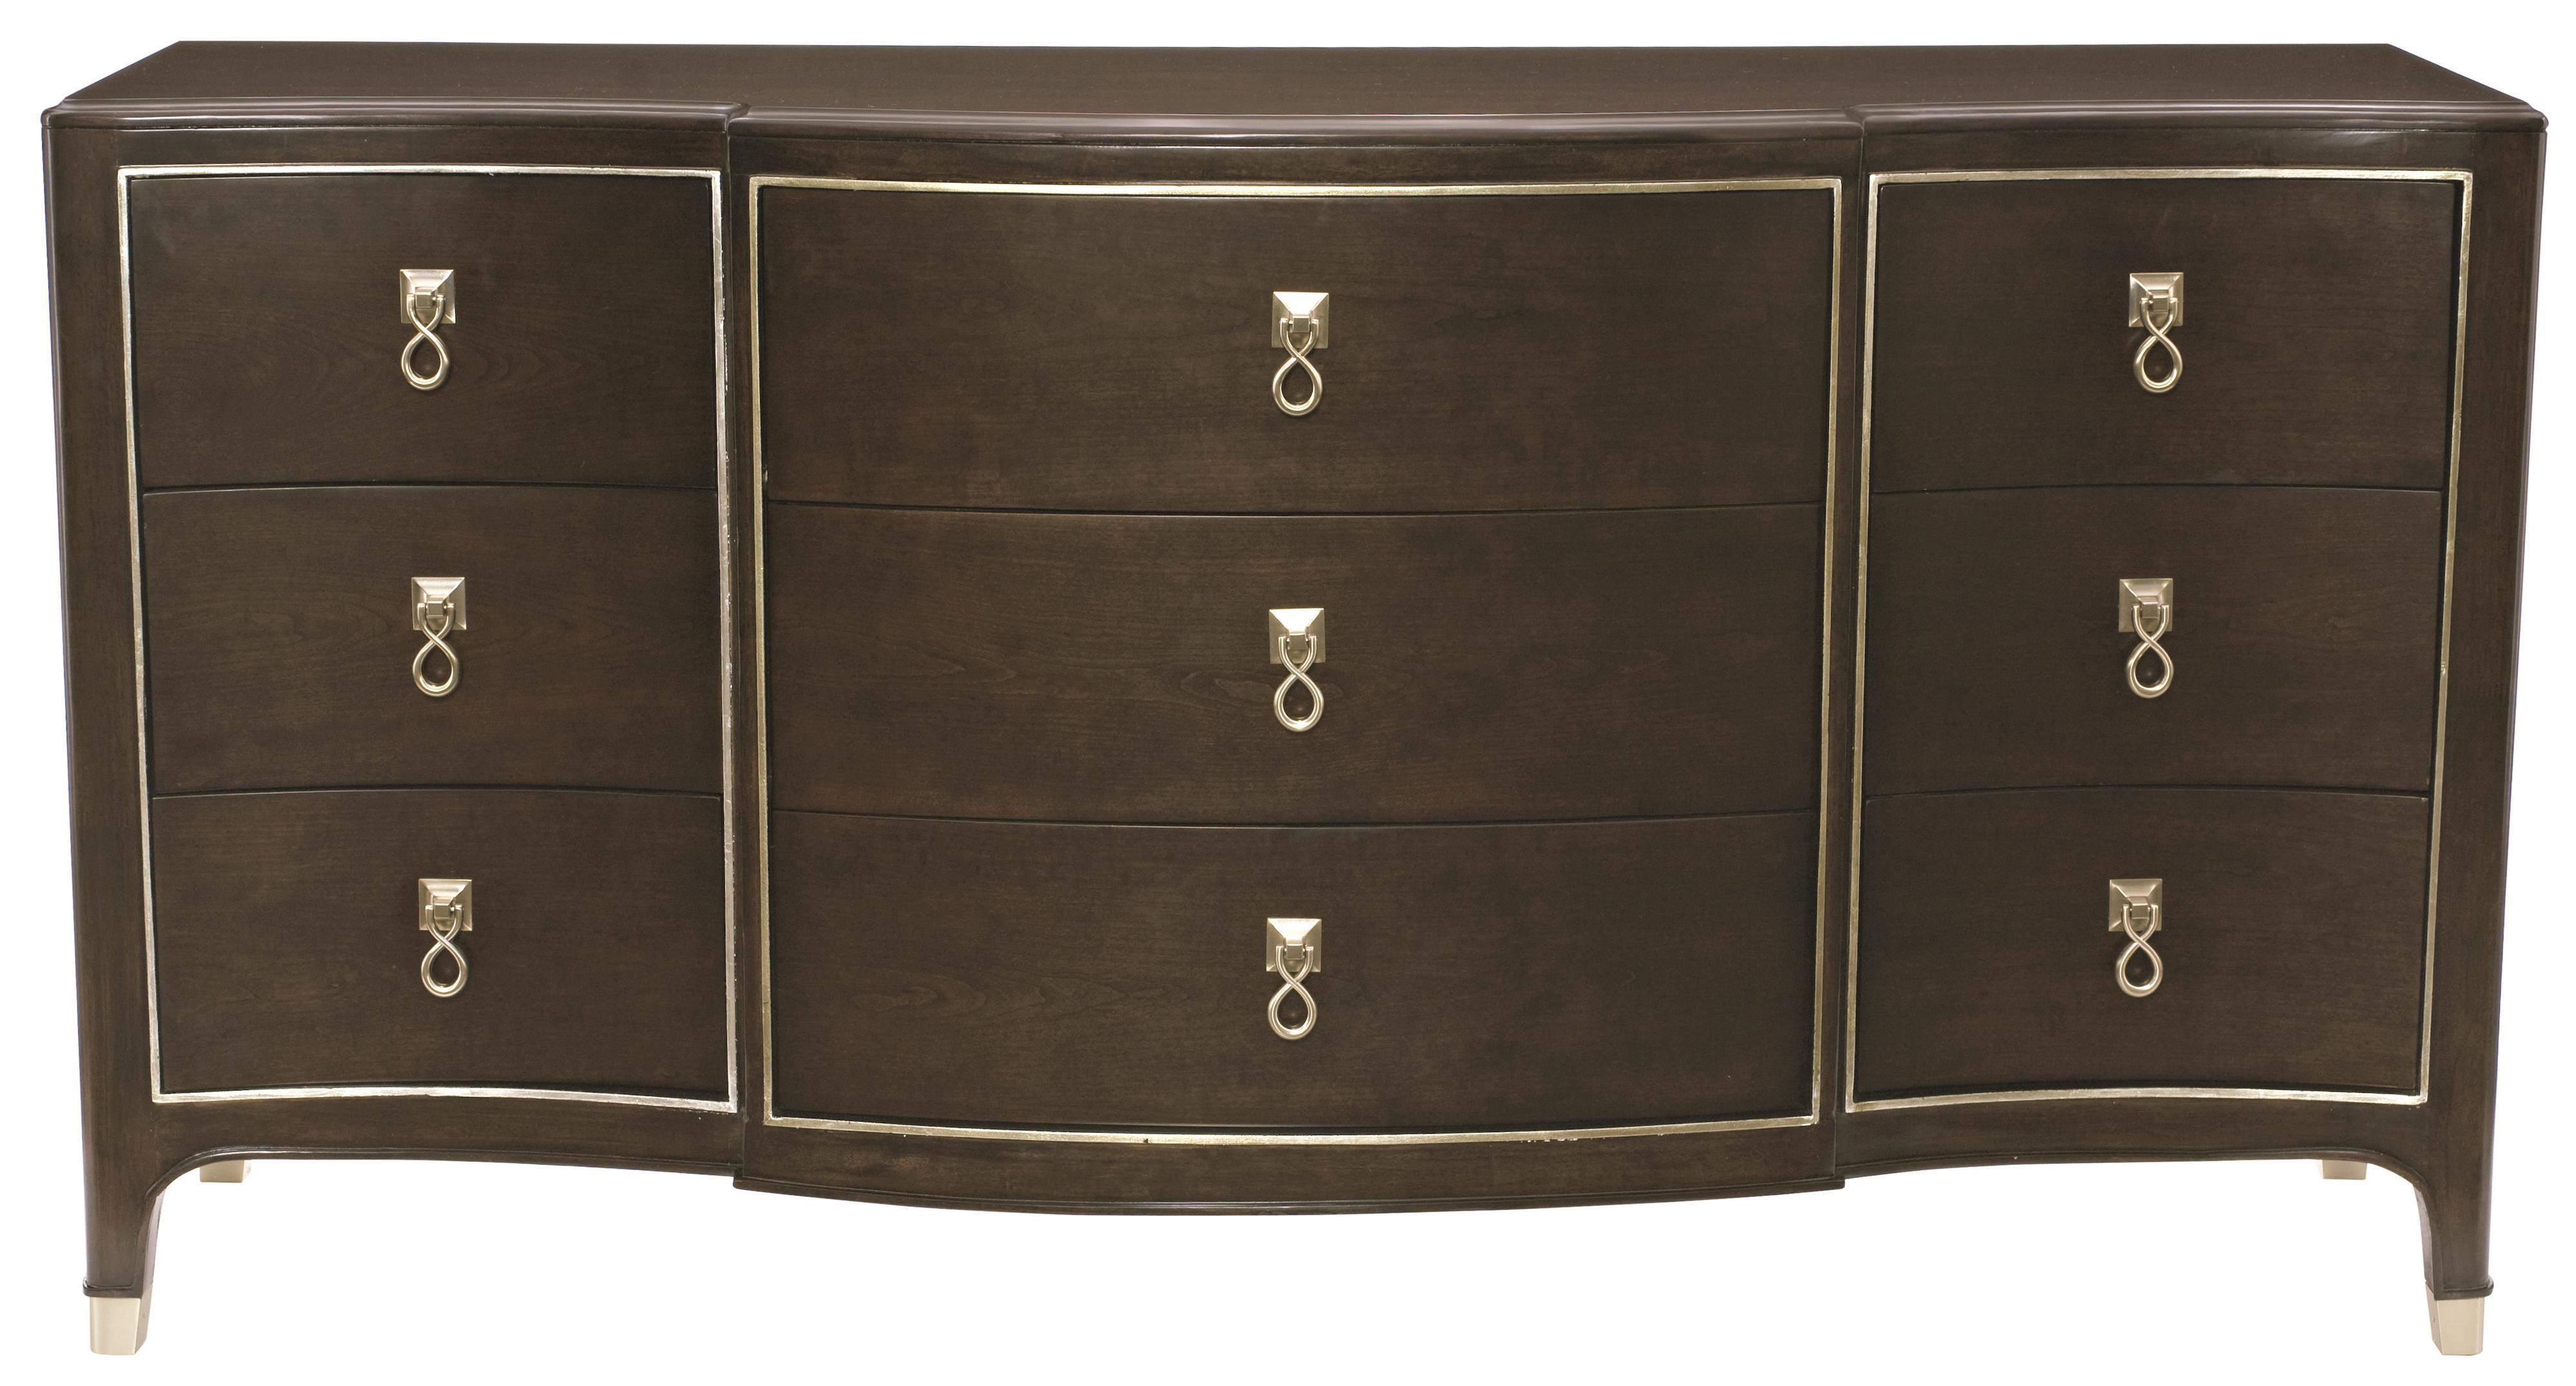 Bernhardt Miramont Dresser - Item Number: 360-053